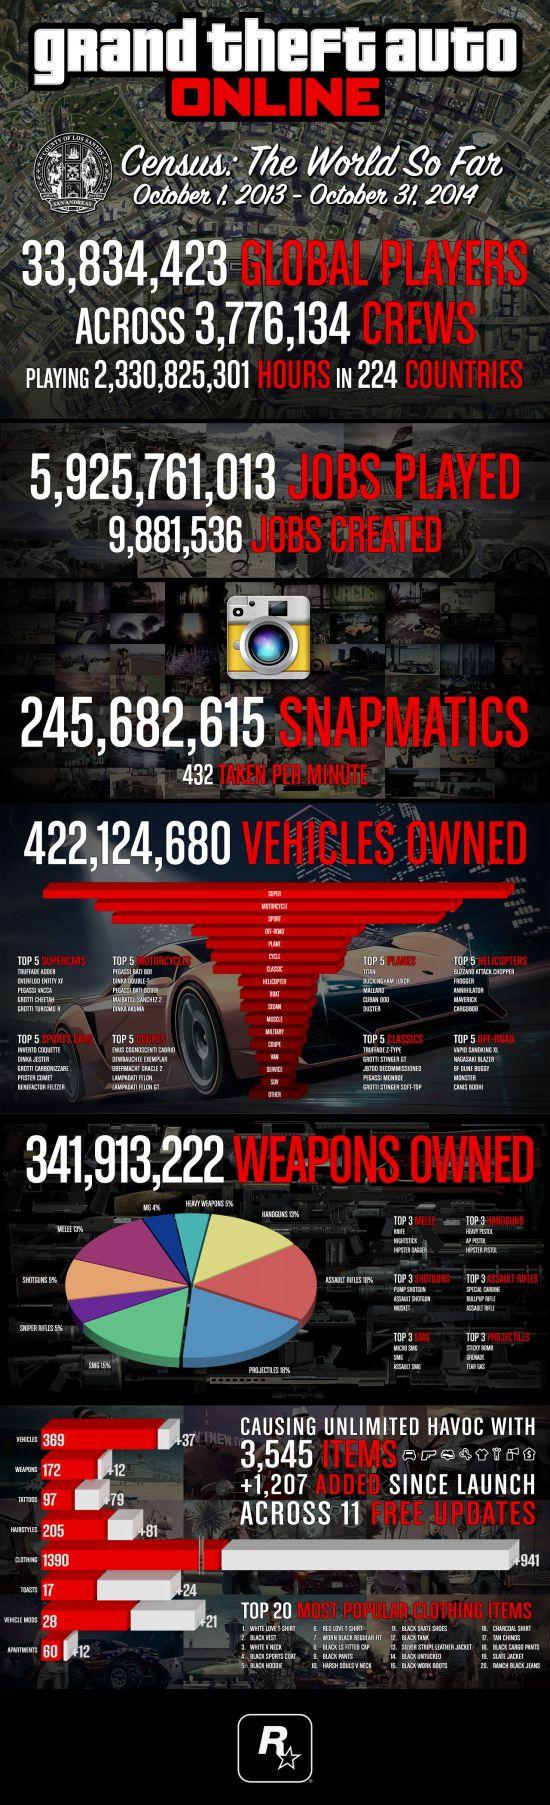 GTA-Online-Infographic